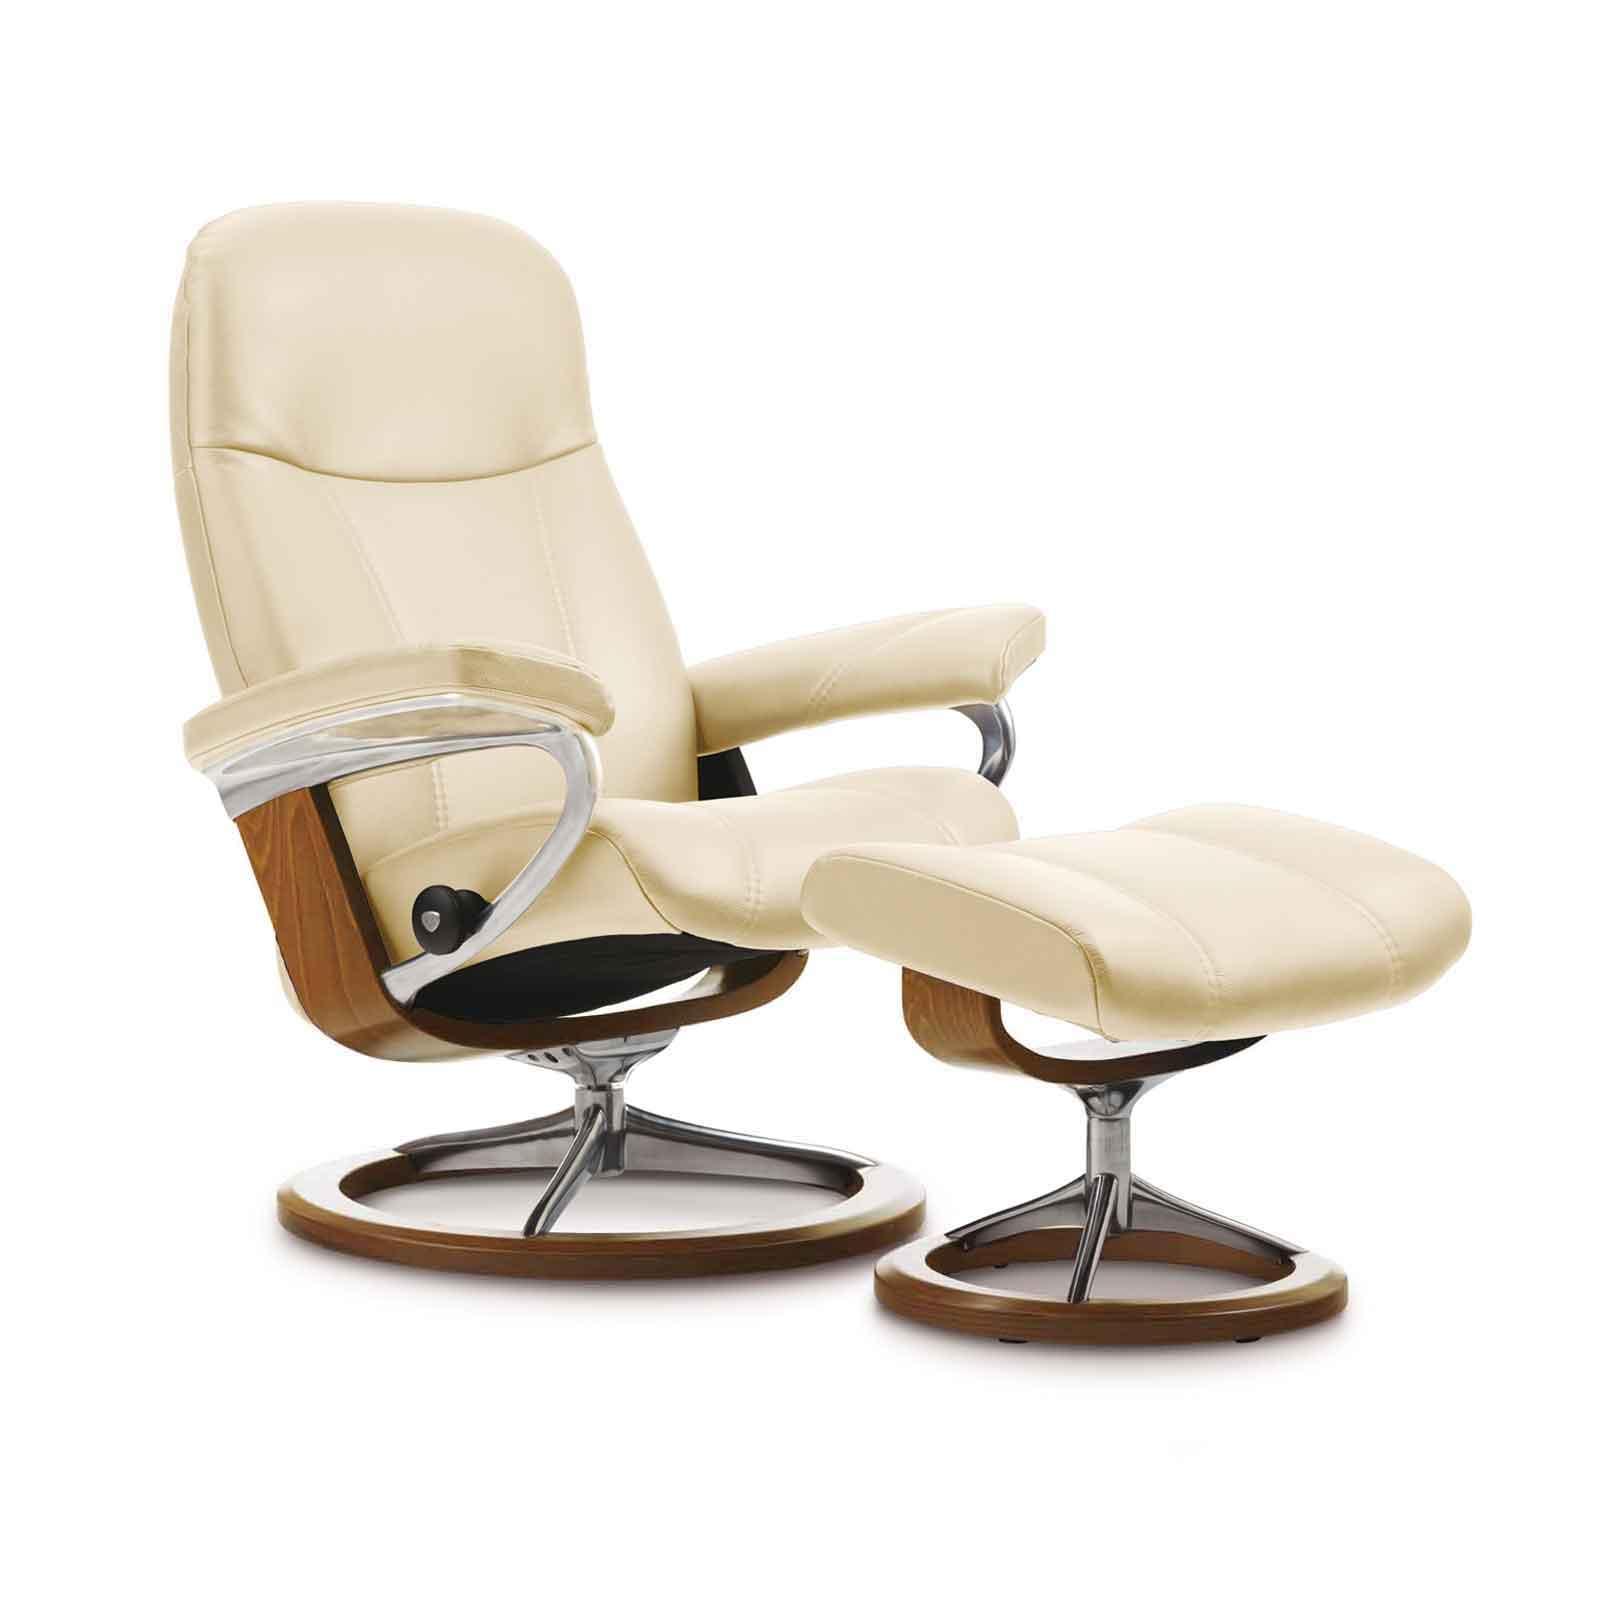 stressless sessel consul cream s leder batick mit hocker. Black Bedroom Furniture Sets. Home Design Ideas